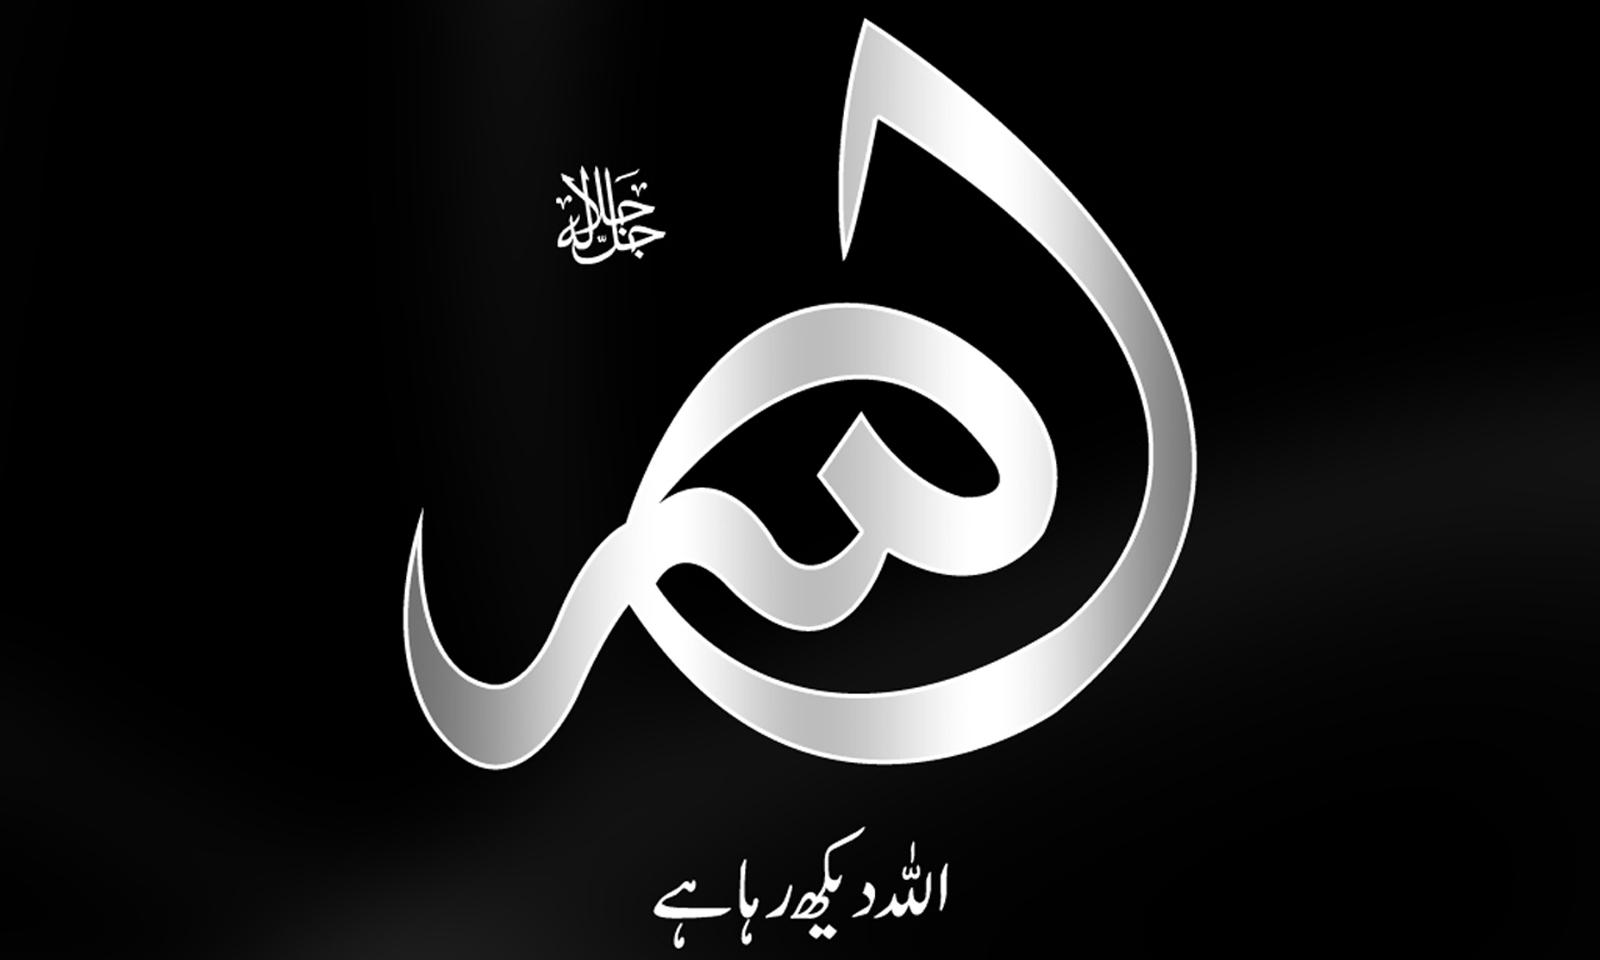 R K Name 3d Wallpaper Islamic Calligraphy Wallpaper Free Wallpaper Wallpaperlepi